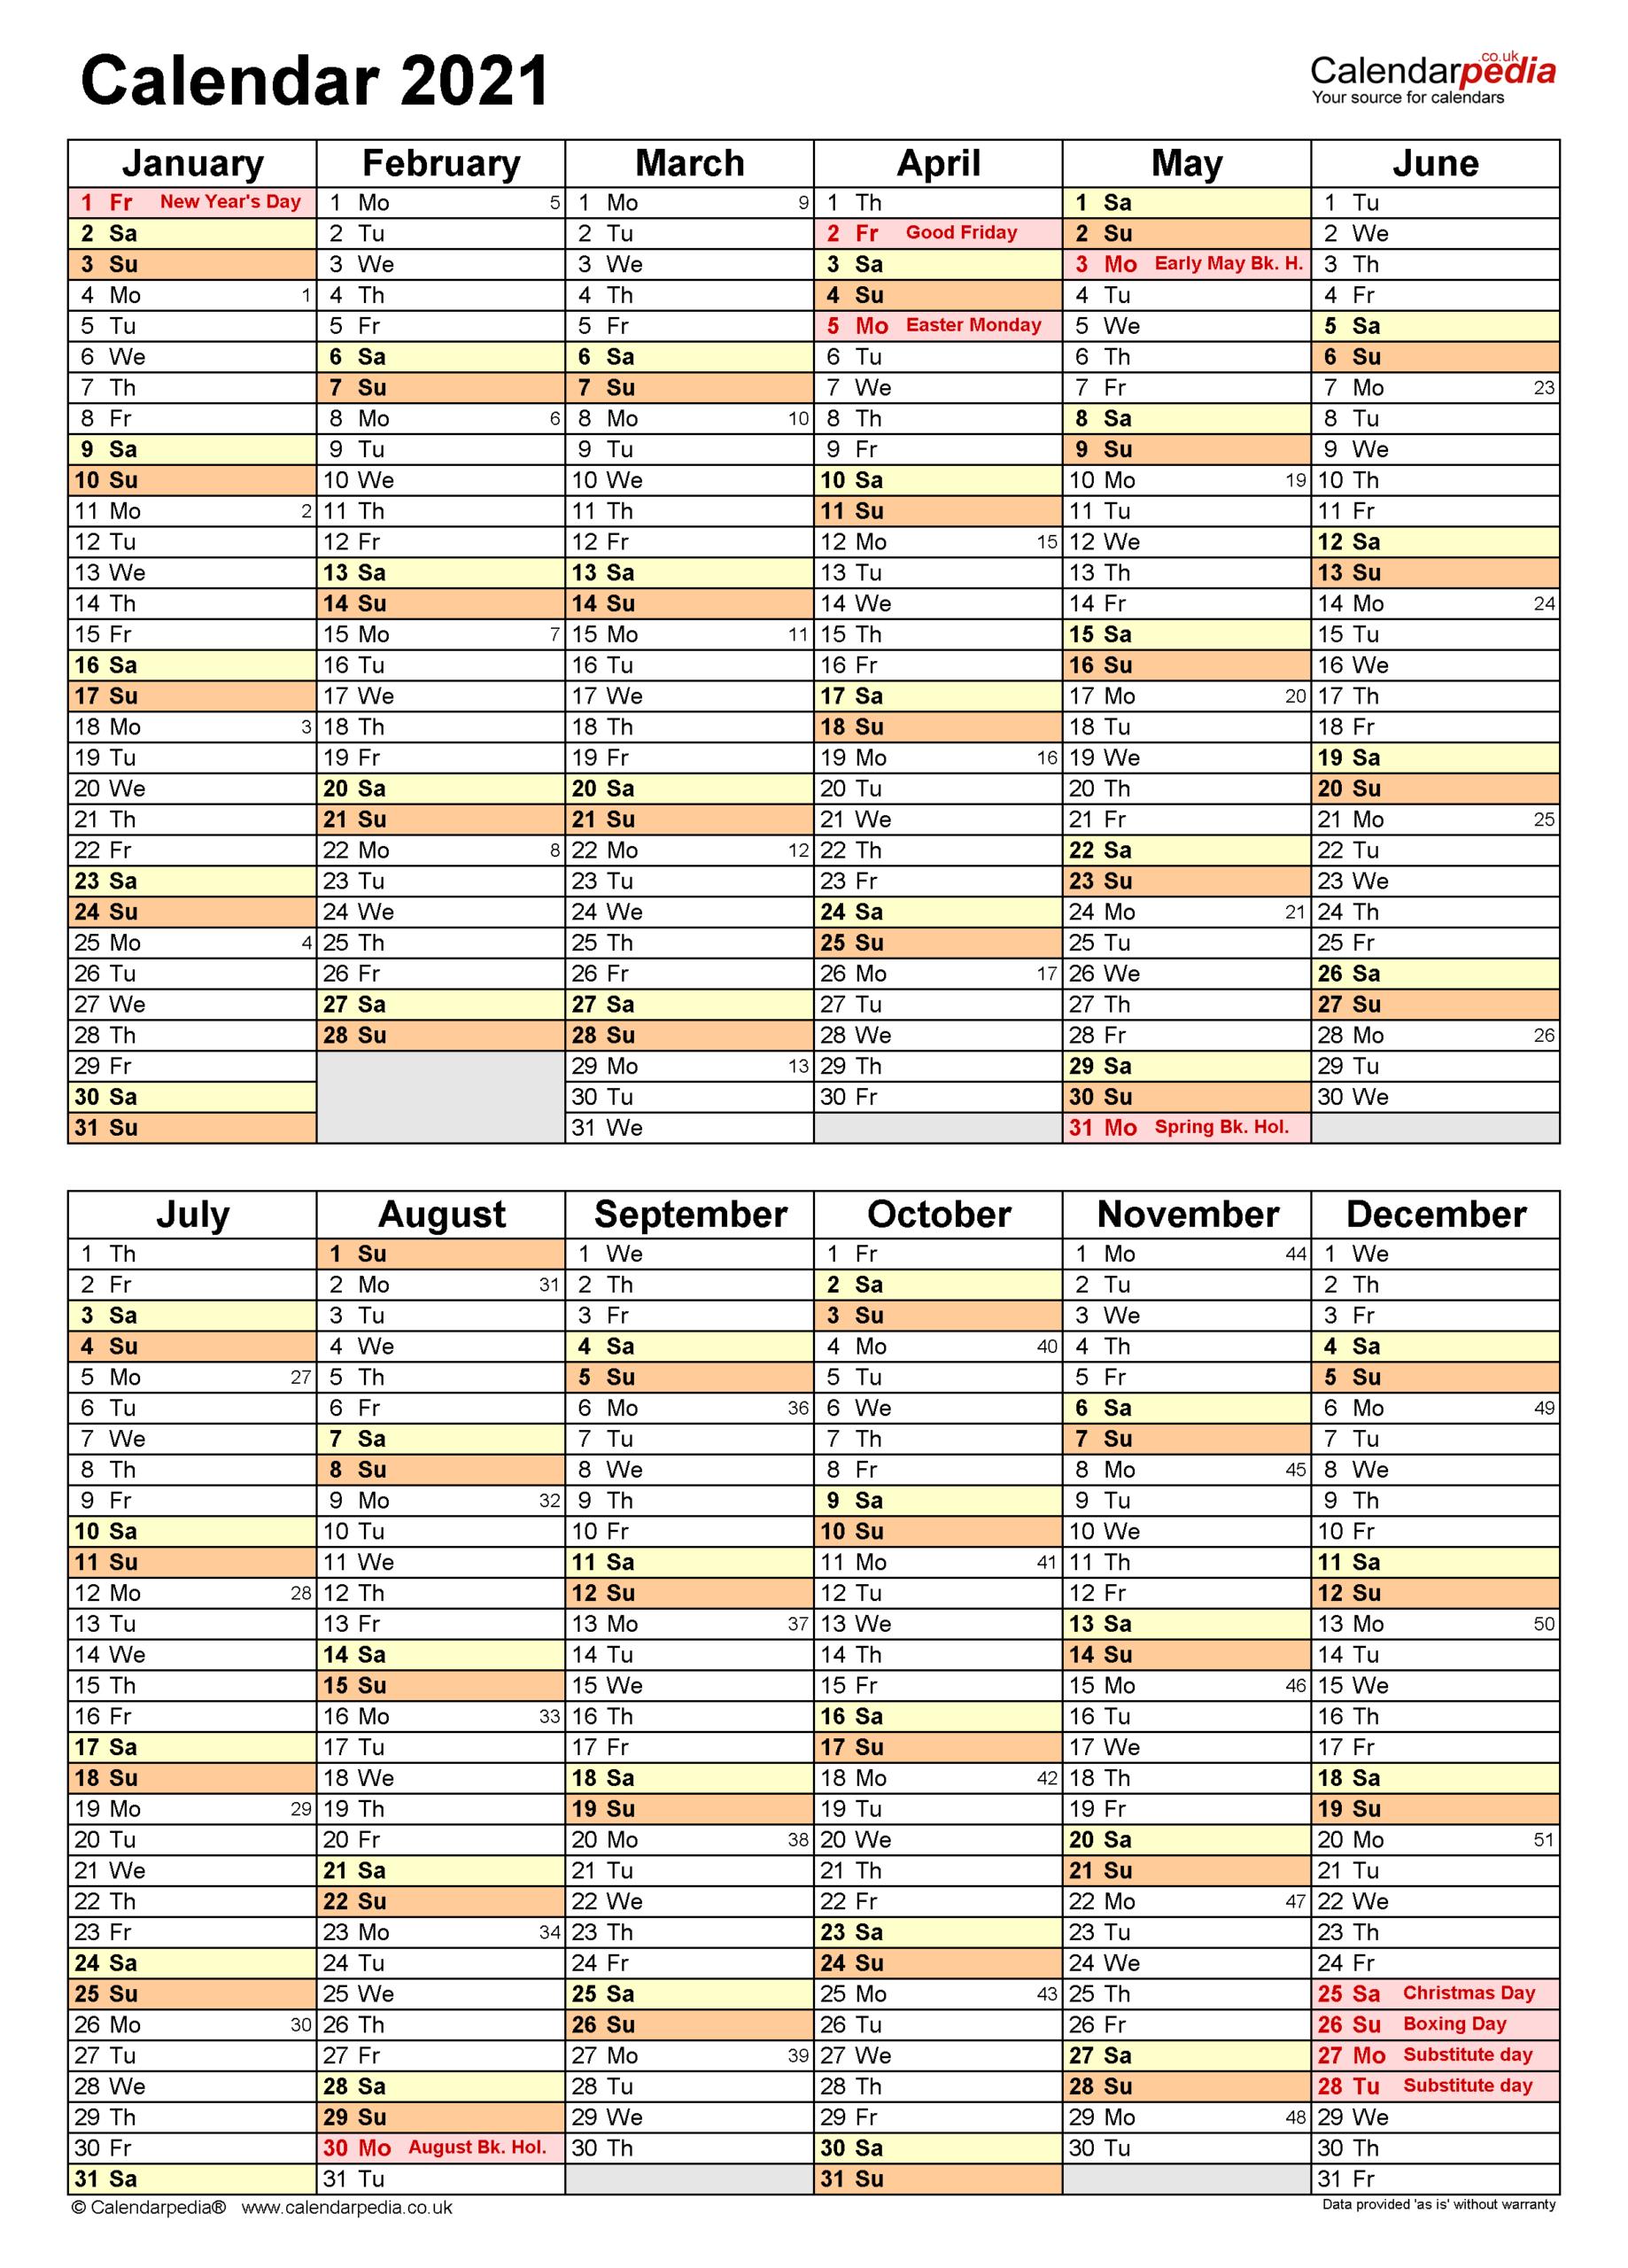 Calendar 2021 (Uk) - Free Printable Microsoft Word Templates regarding 2021-2021 Two Year Planner: 2 Year